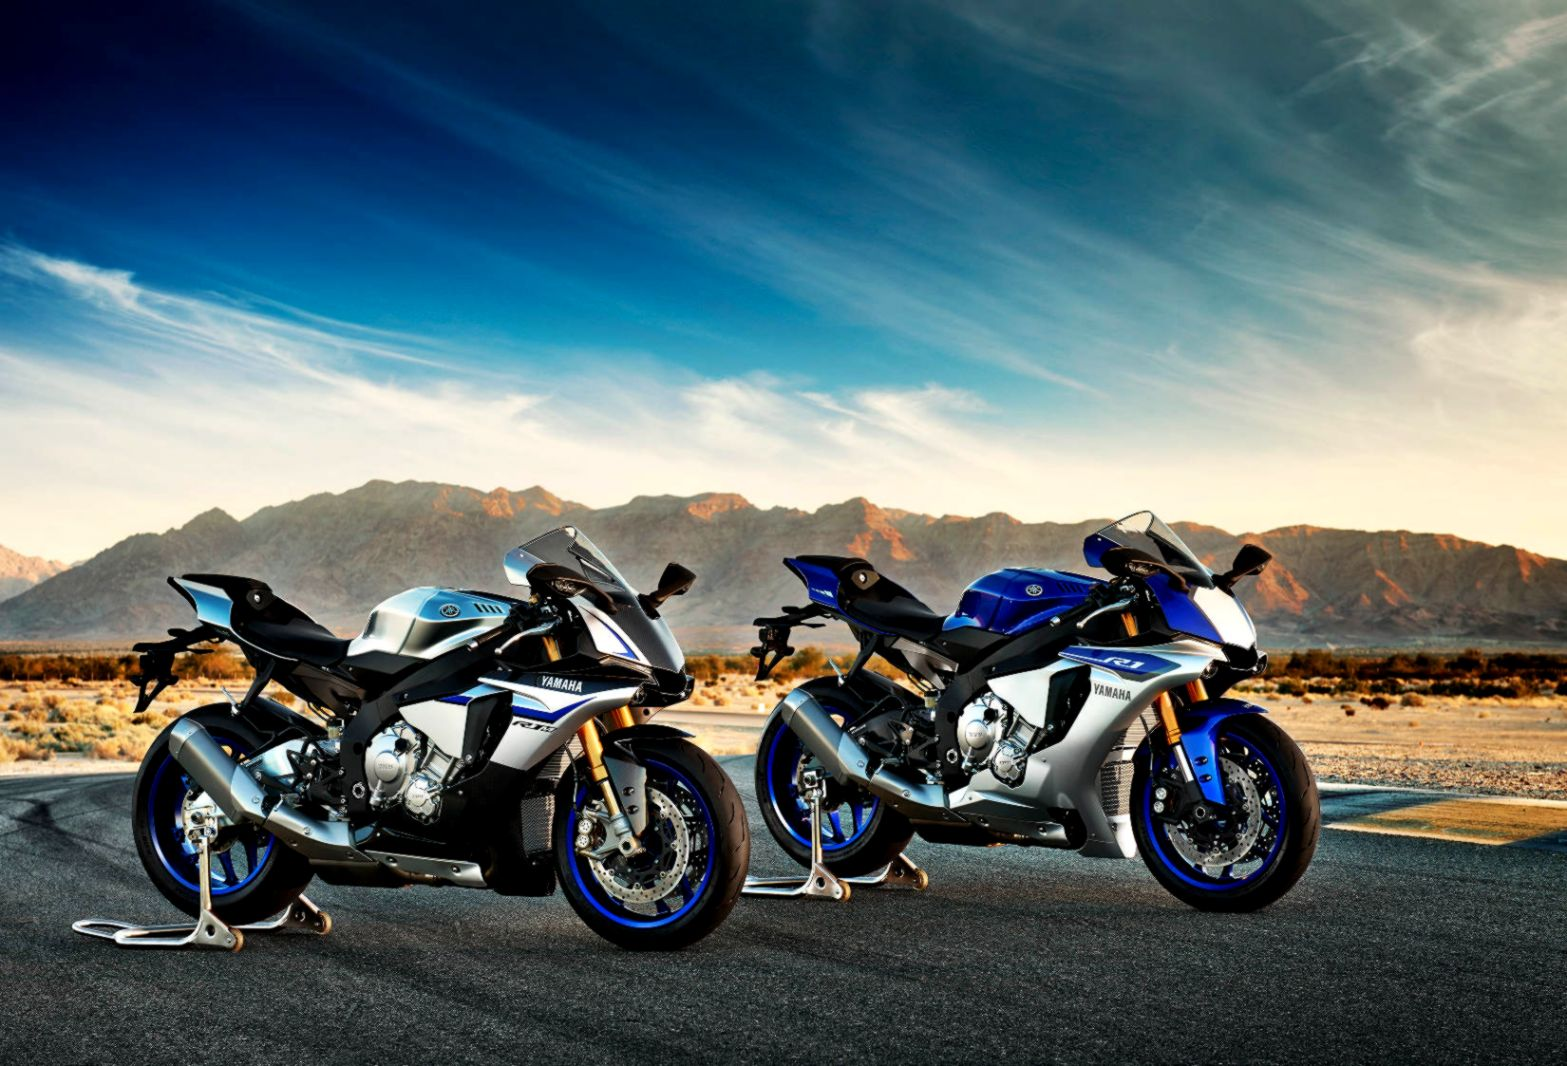 Yamaha R1 Blue Superbike Hd Wallpapers Emoji